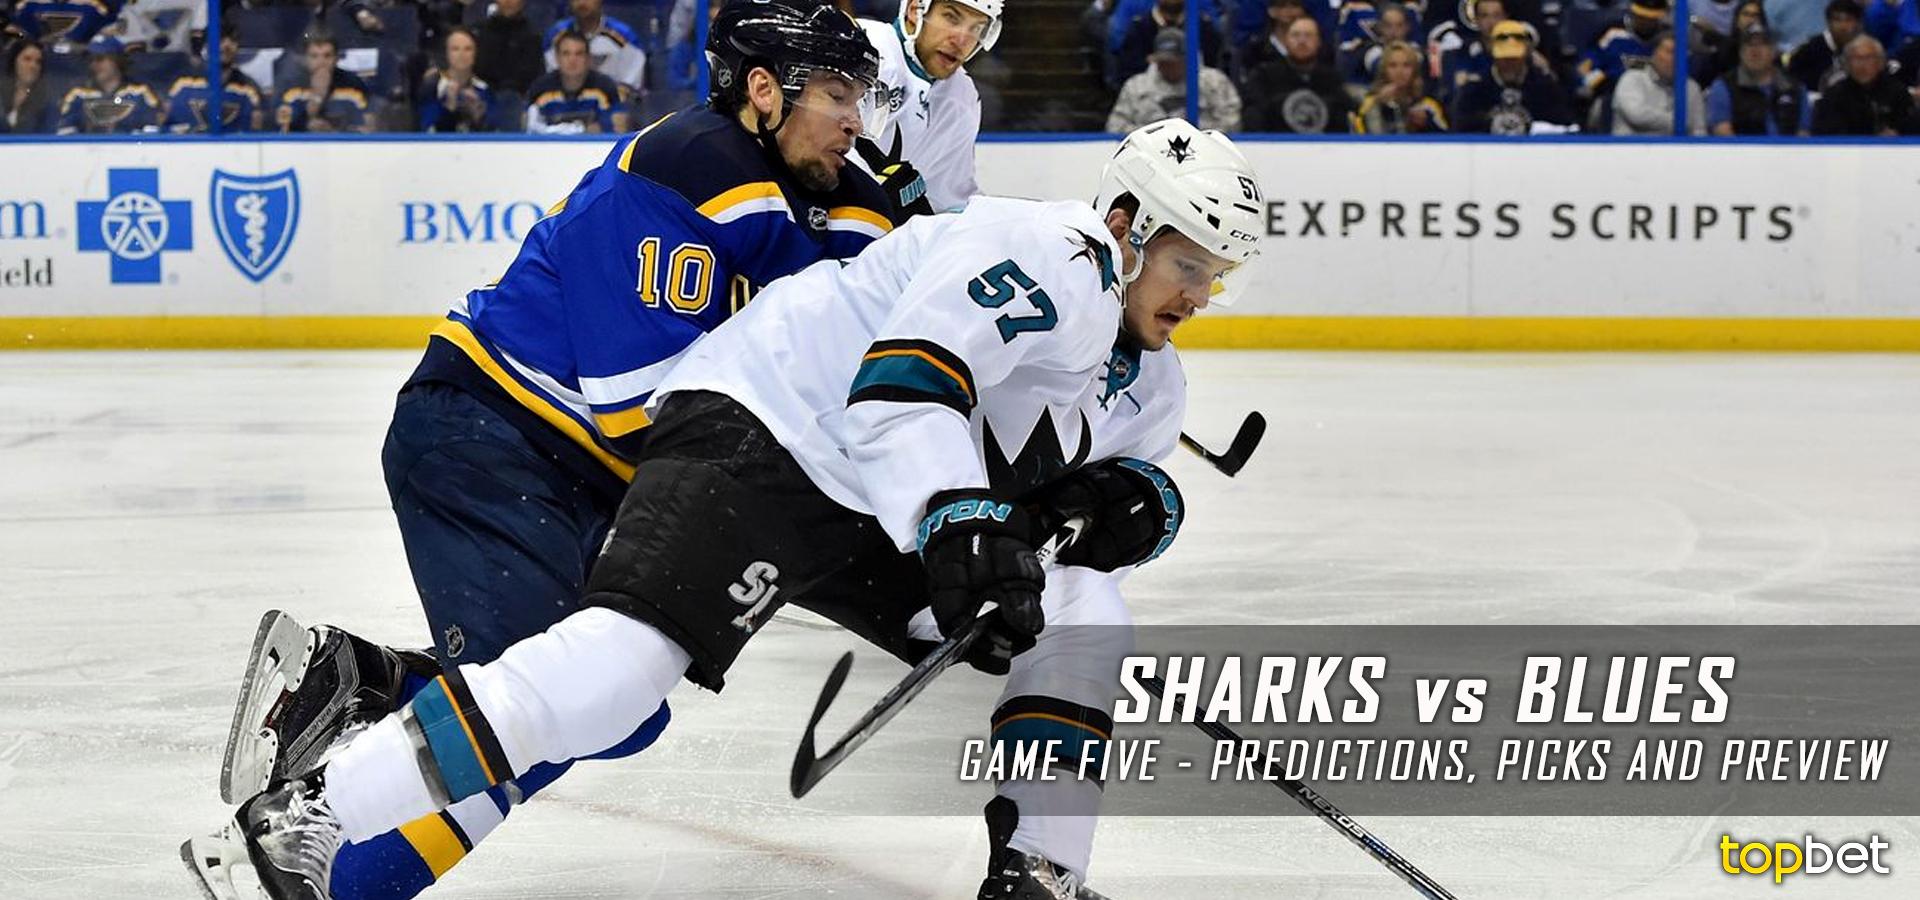 sharks vs blues - photo #30